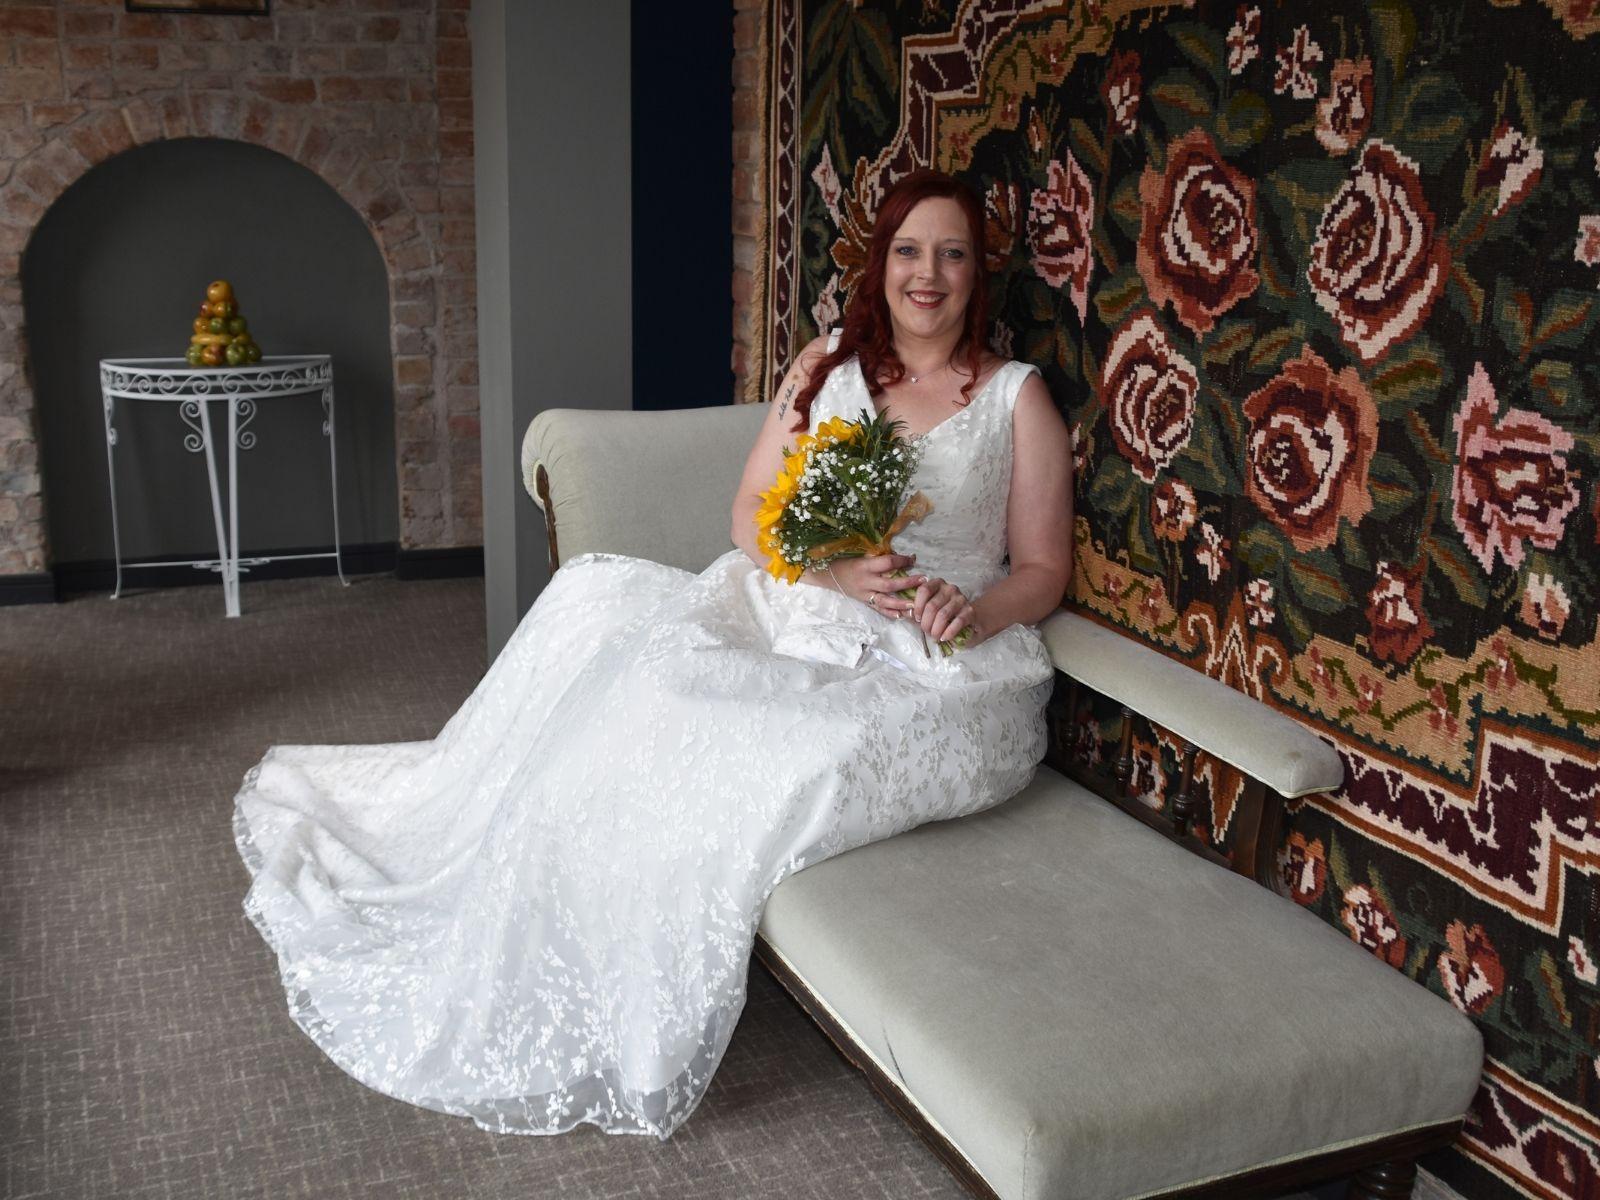 Millie May wedding dress Stratford-Upon-Avon